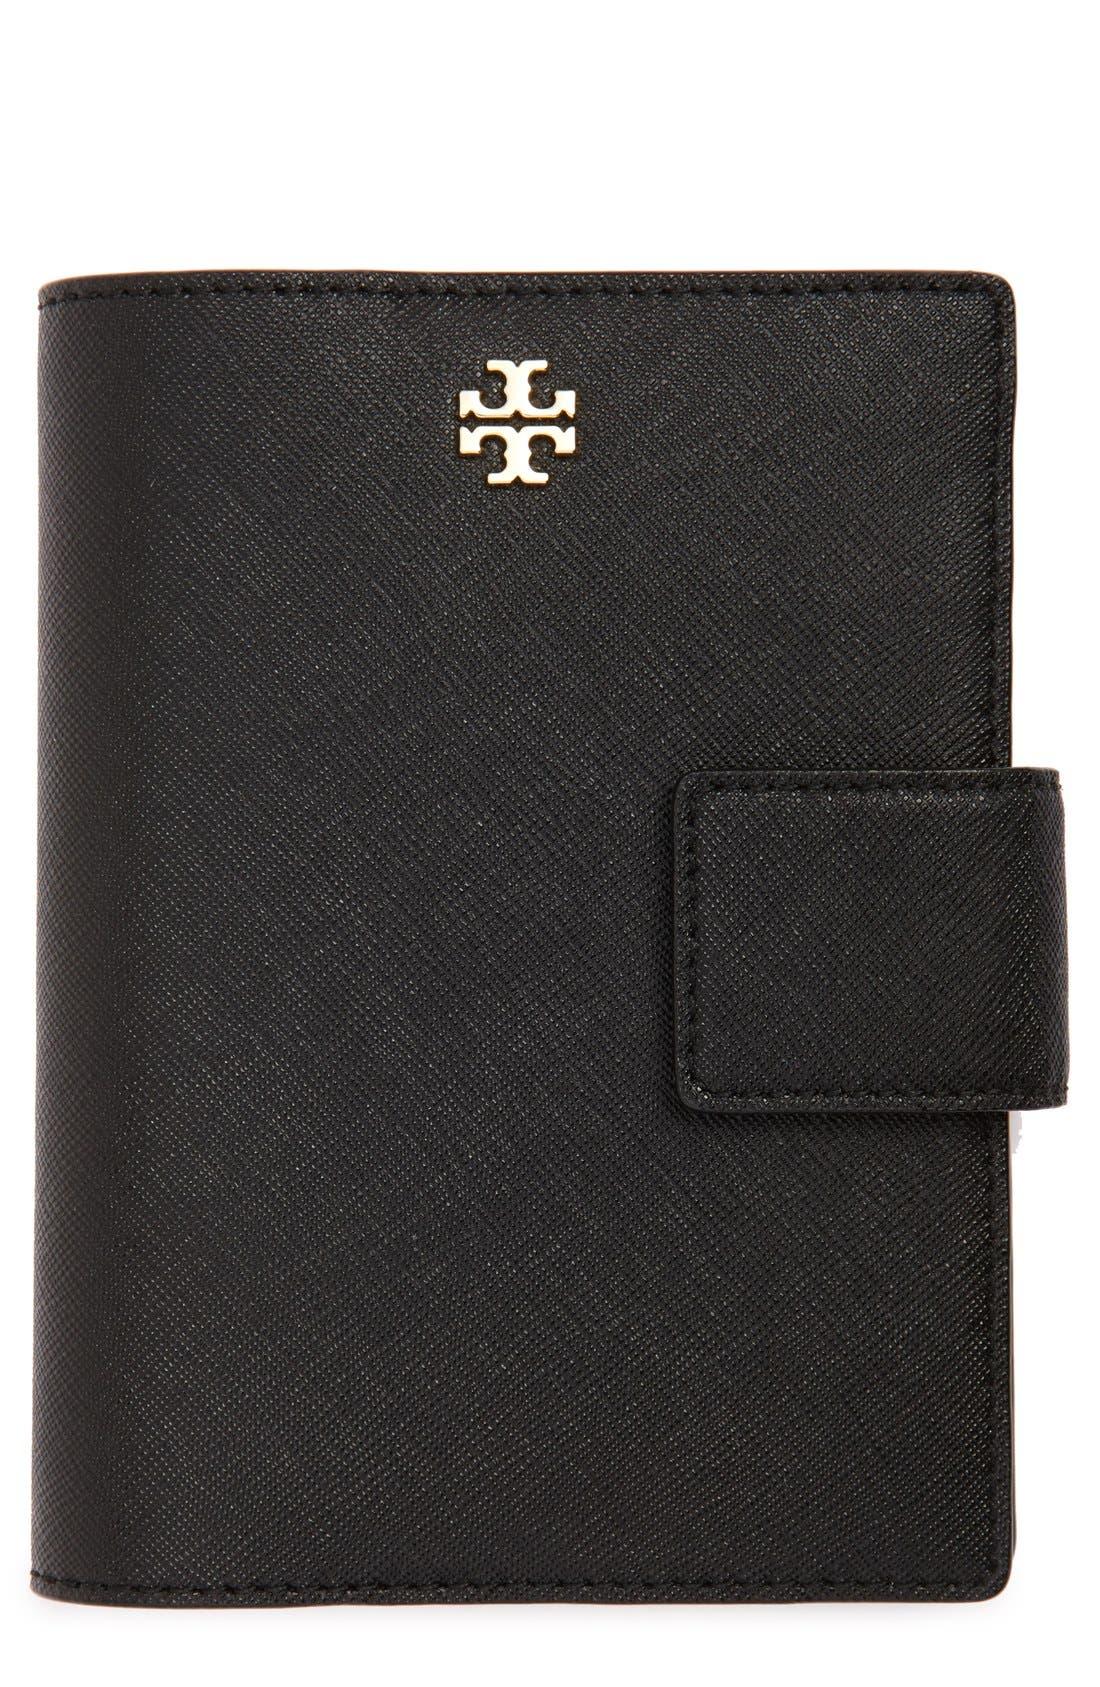 Main Image - Tory Burch 'Robinson' Passport Holder